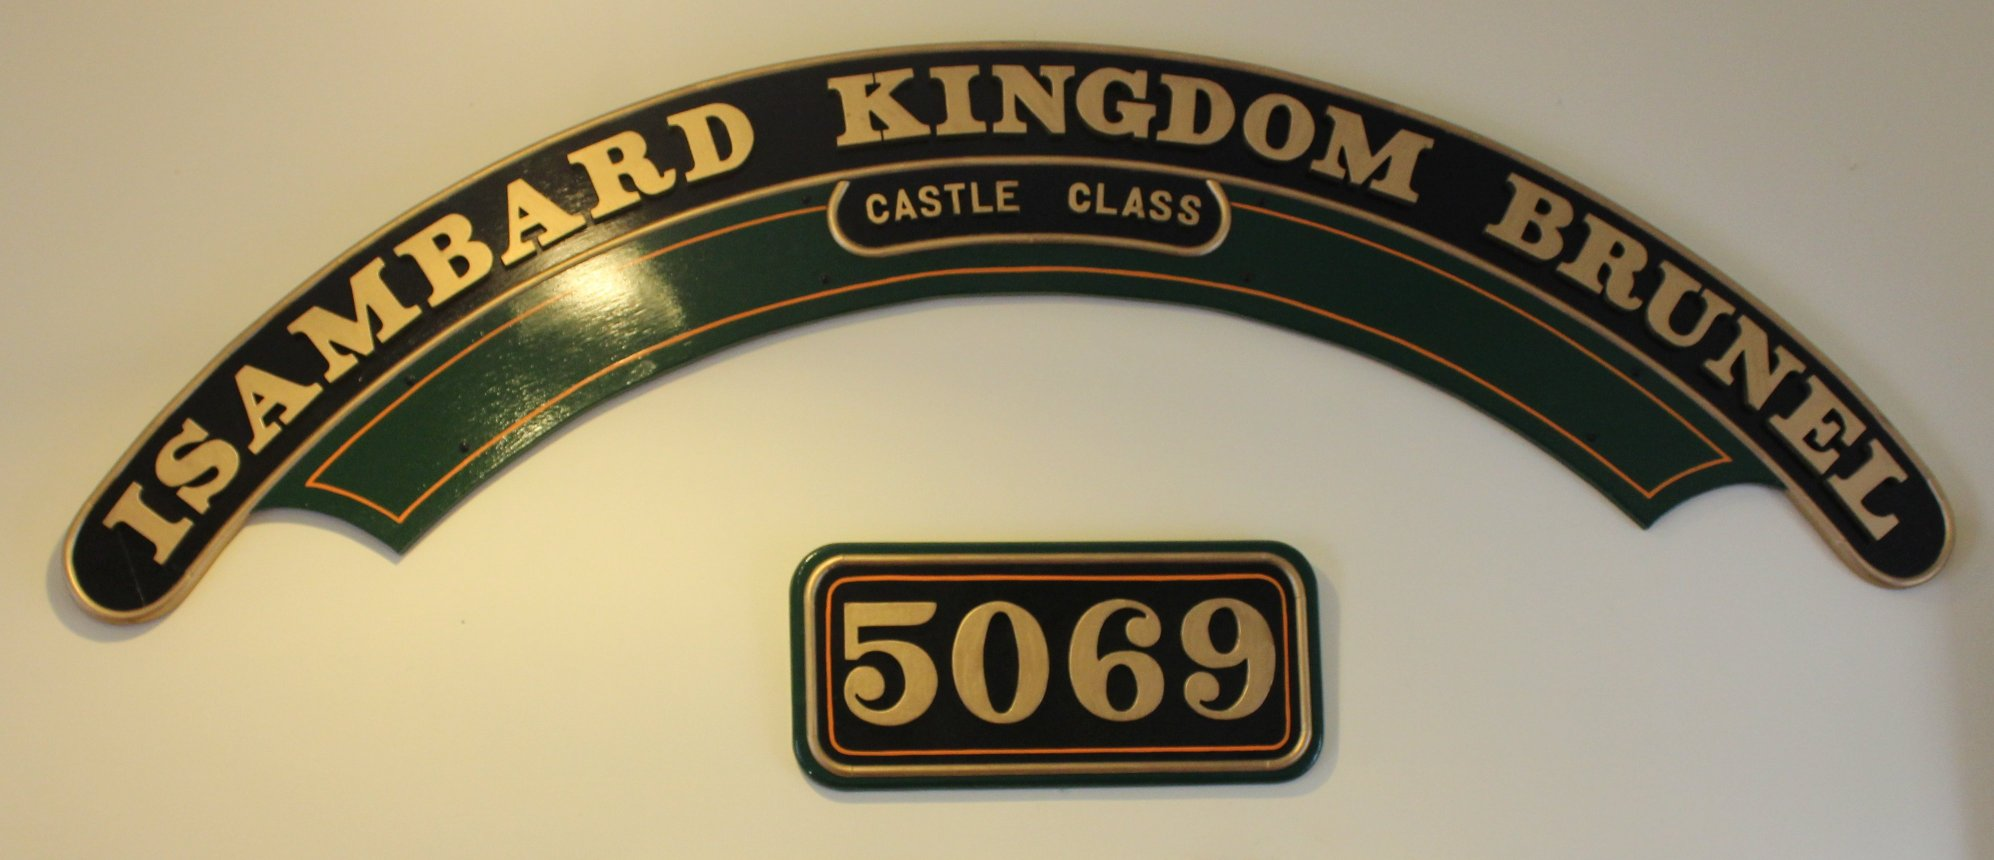 Brunel Room Booking